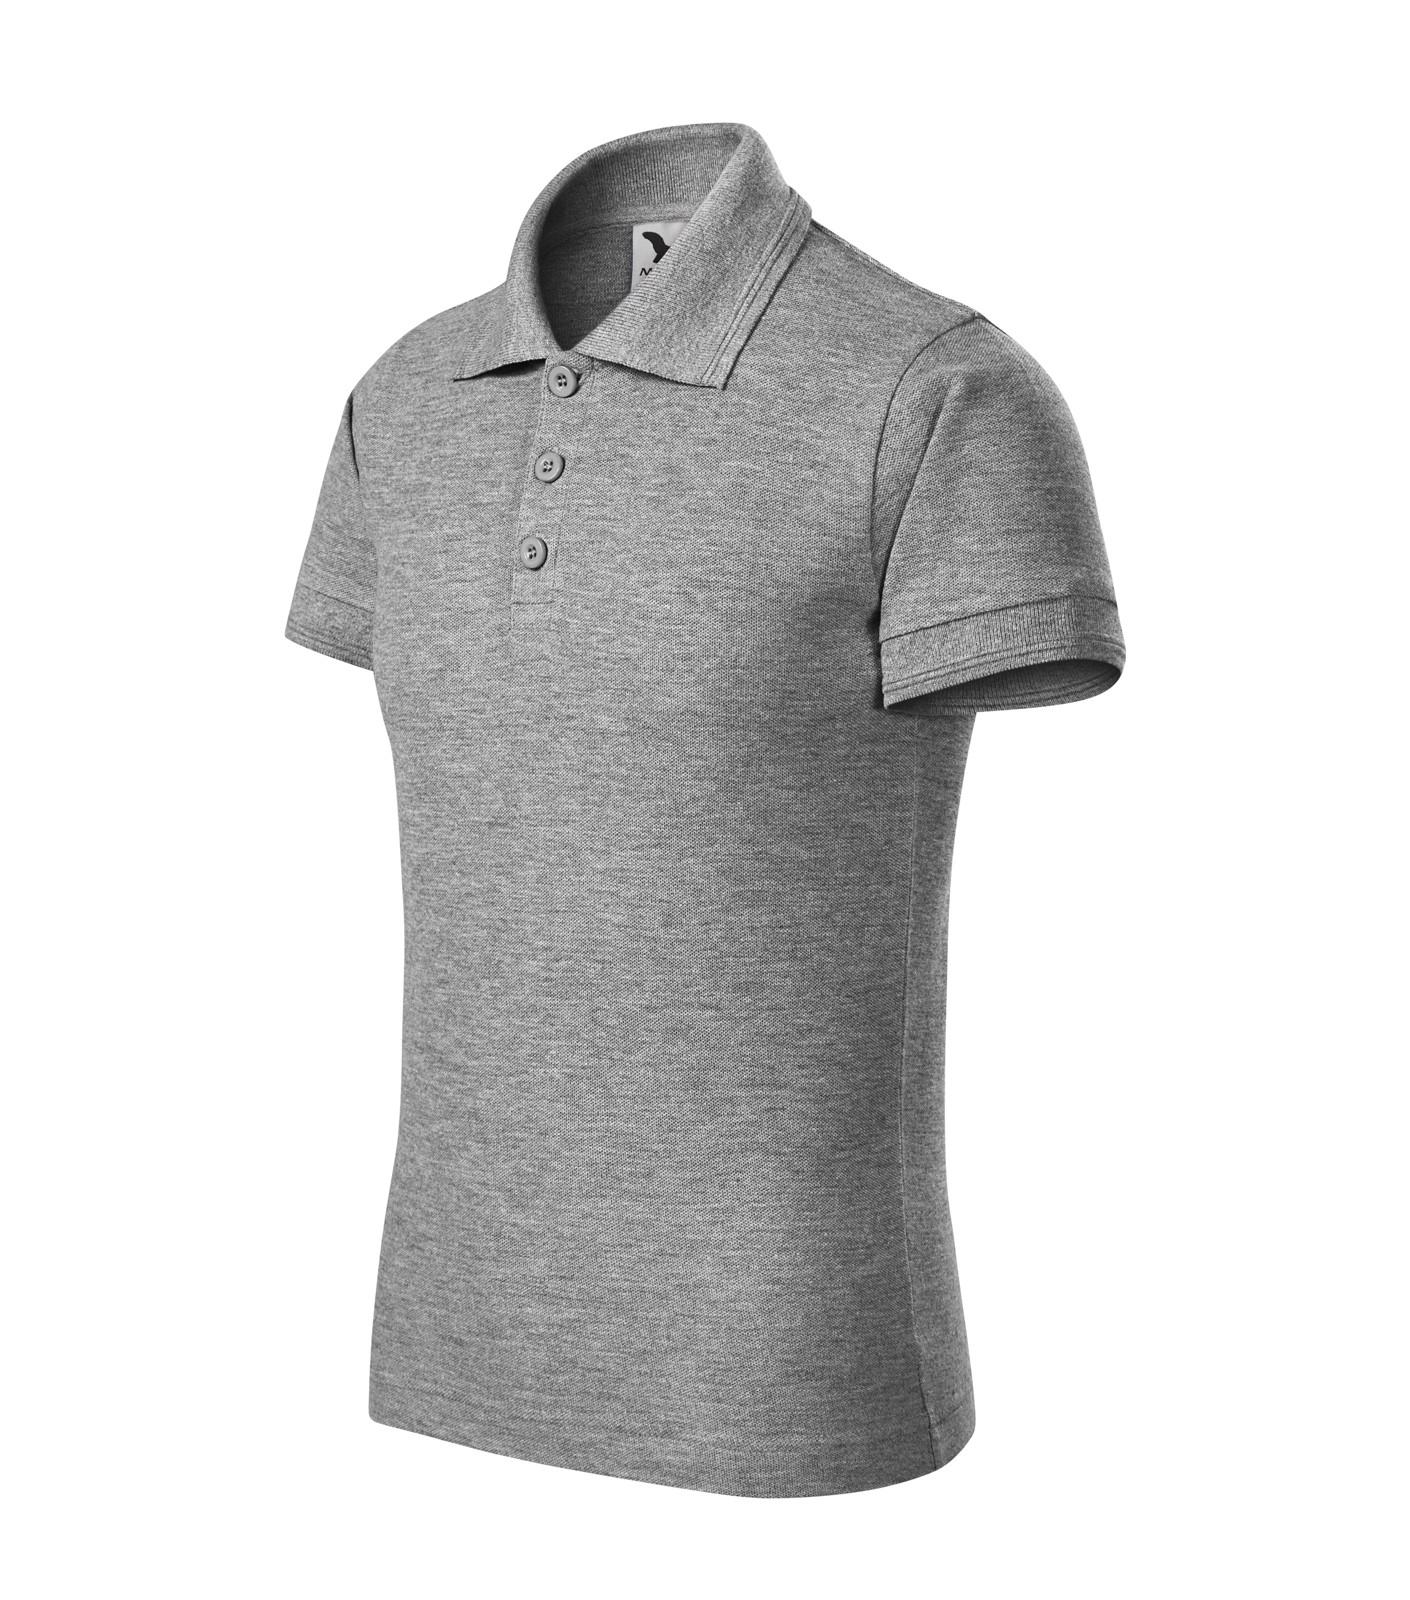 Polo Shirt Kids Malfini Pique Polo - Dark Gray Melange / 12 years